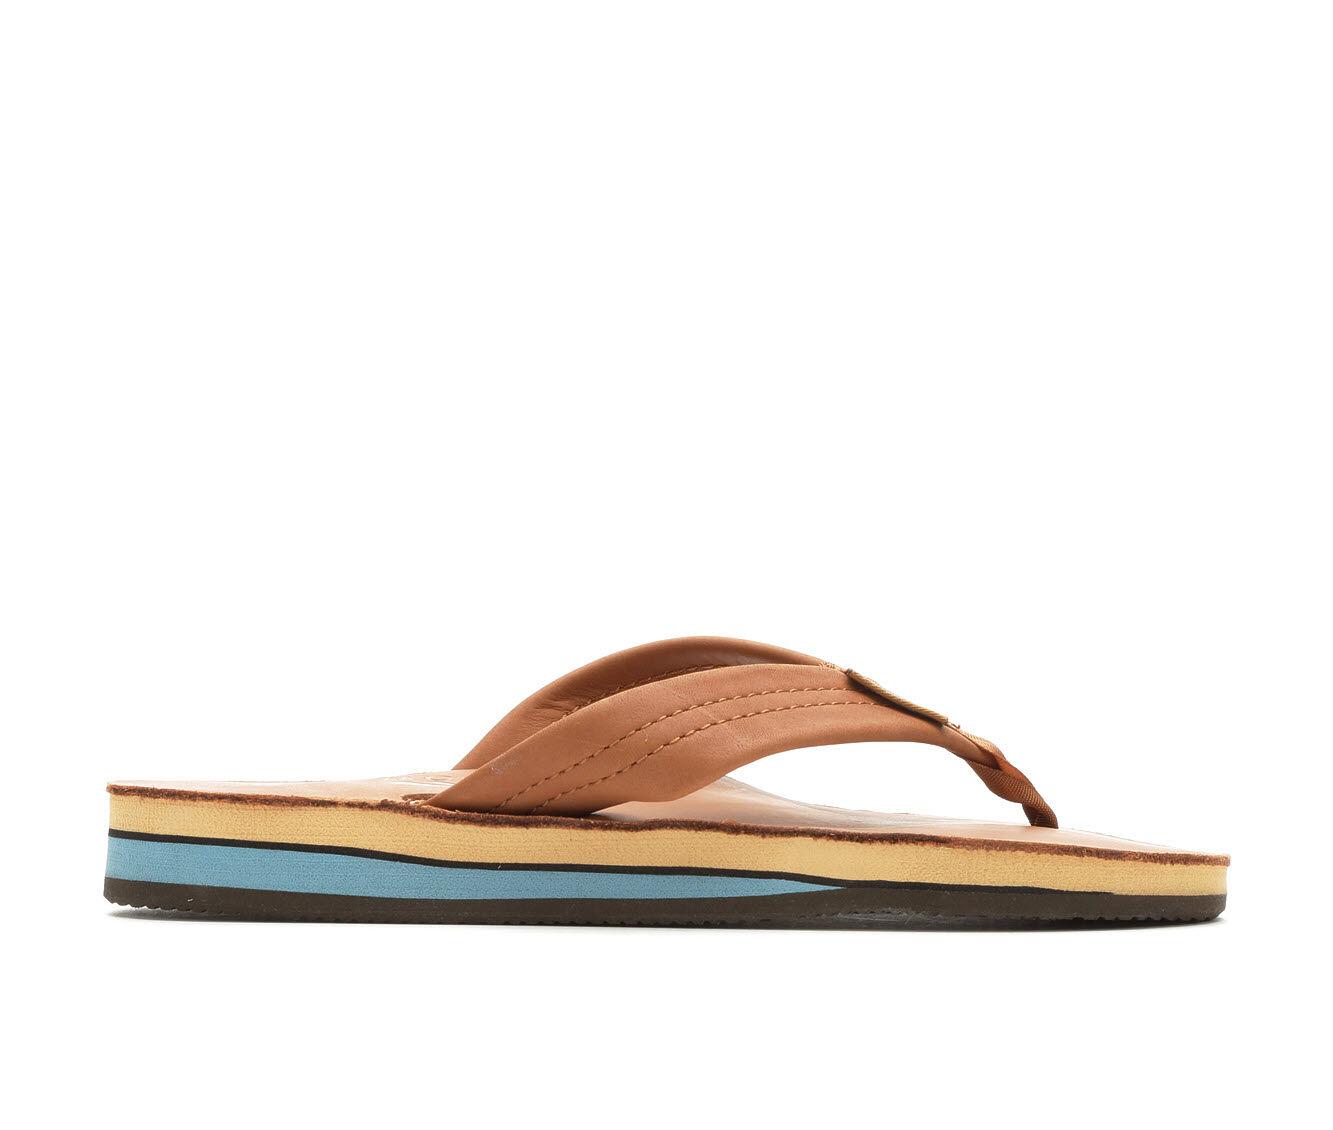 Delicate styles Women's Rainbow Sandals Premier Leather Double Layer -302ALTS Flip-Flops Classic Tan/Blu